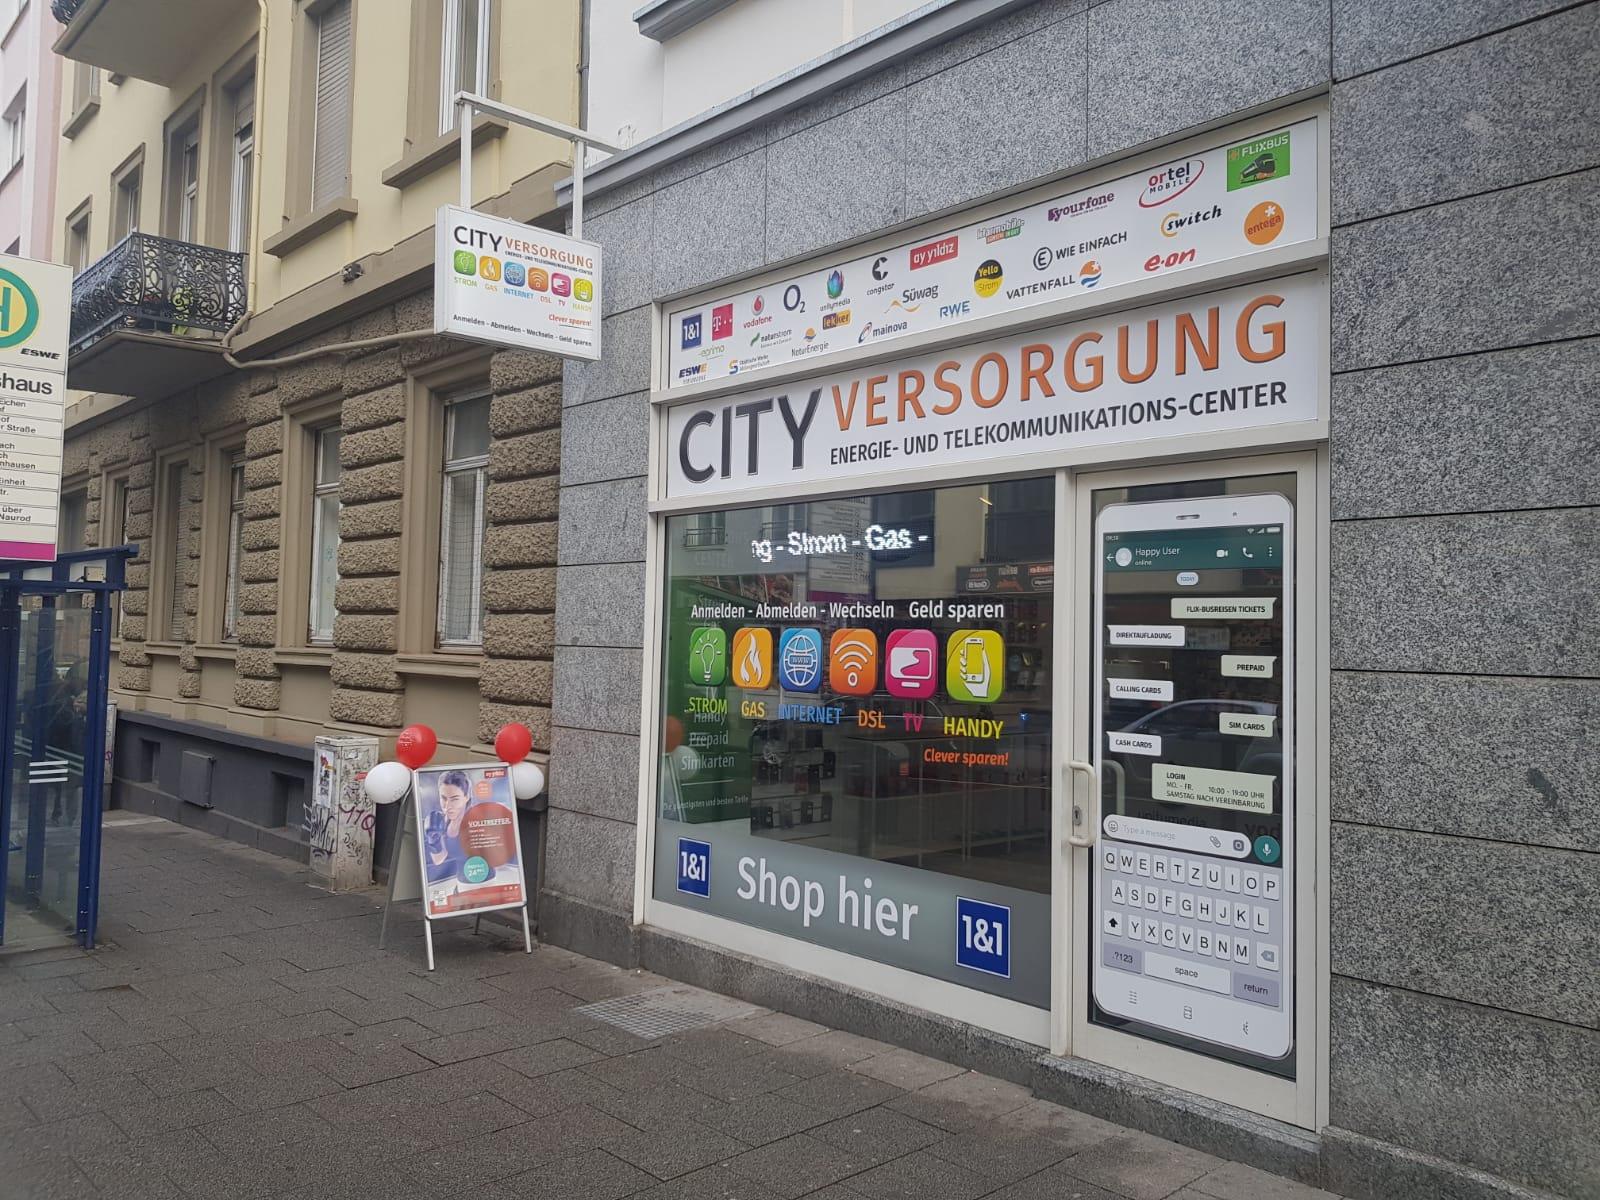 City Versorgung 1&1 Shop Wiesbaden